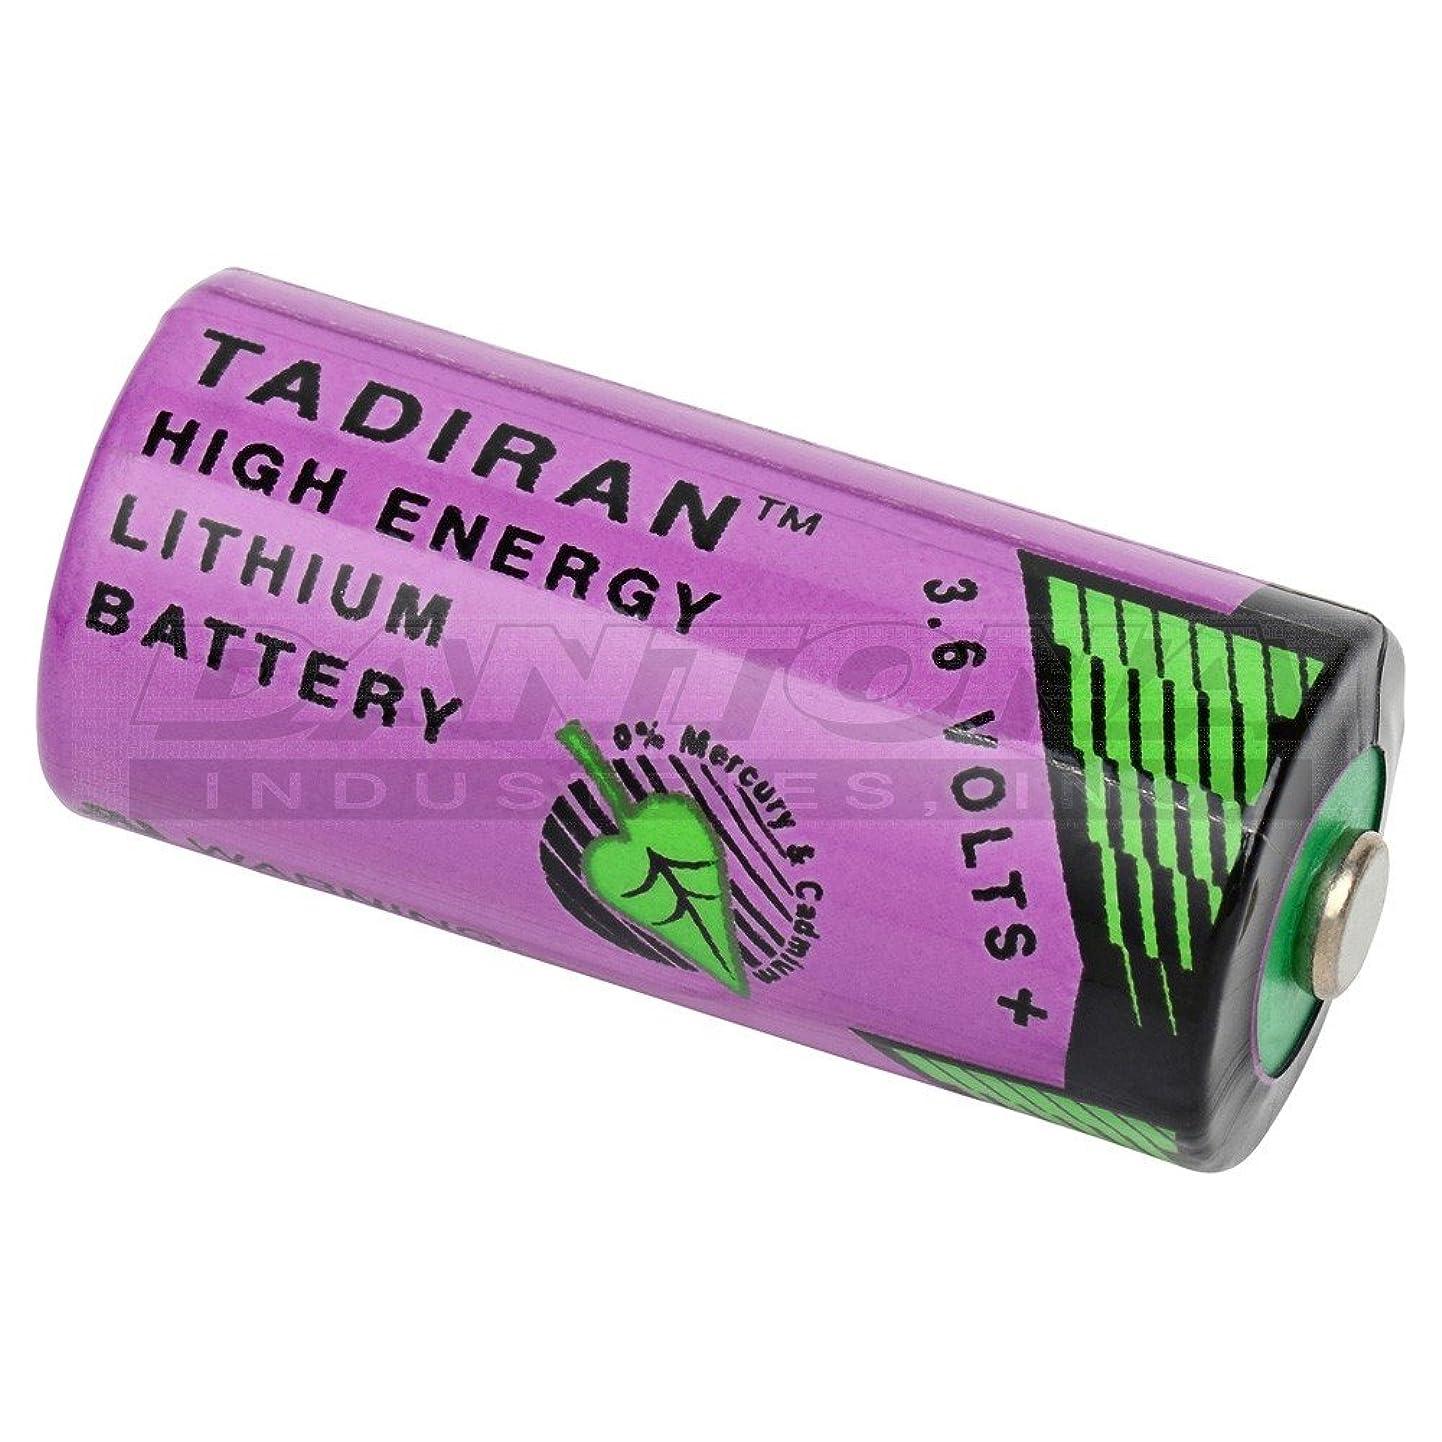 Tadiran 3.6 Volt, 1450 mAh, 2/3 AA Lithium Battery lirwrqacvlx6